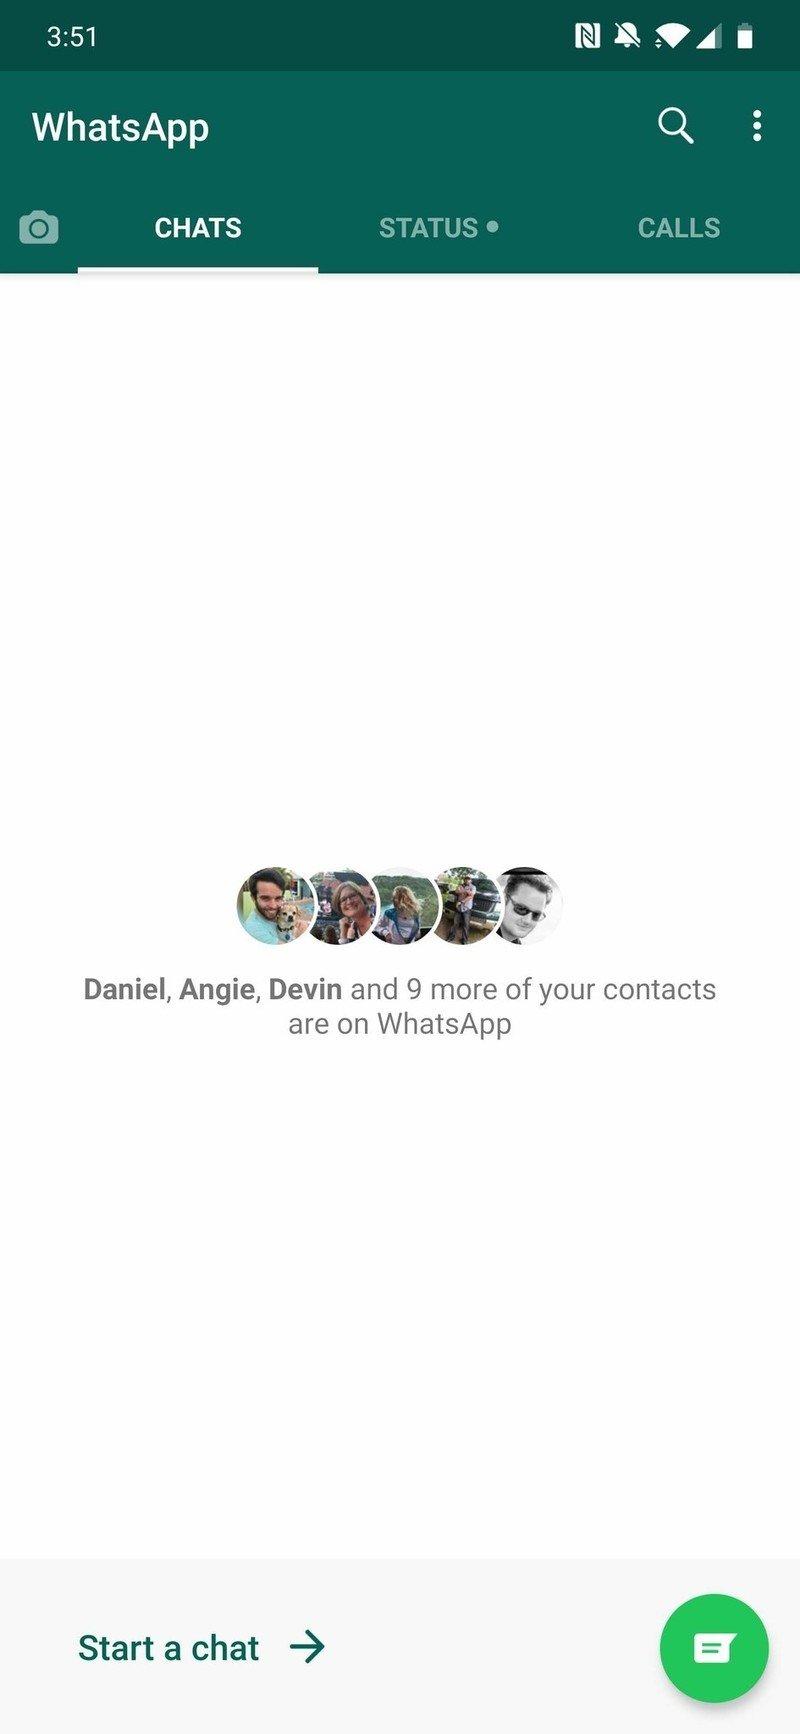 whatsapp-backup-messages-6.jpg?itok=OIy3